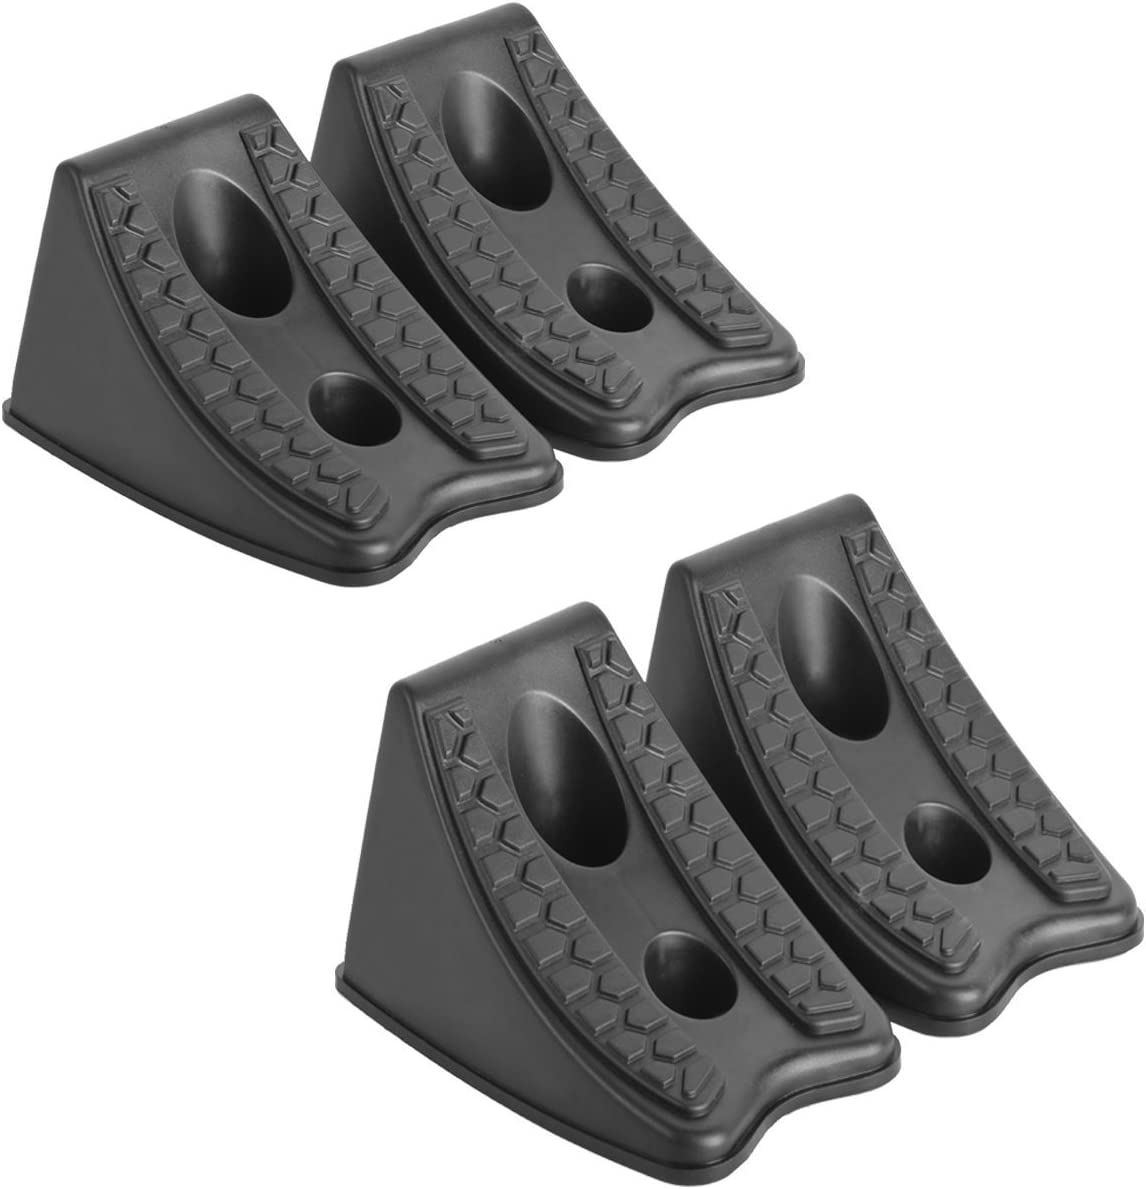 DEDC Calzo de Plástico para Ruedas de Caravana Cuña Ruedas de Caravana Coche (4 Calzos)